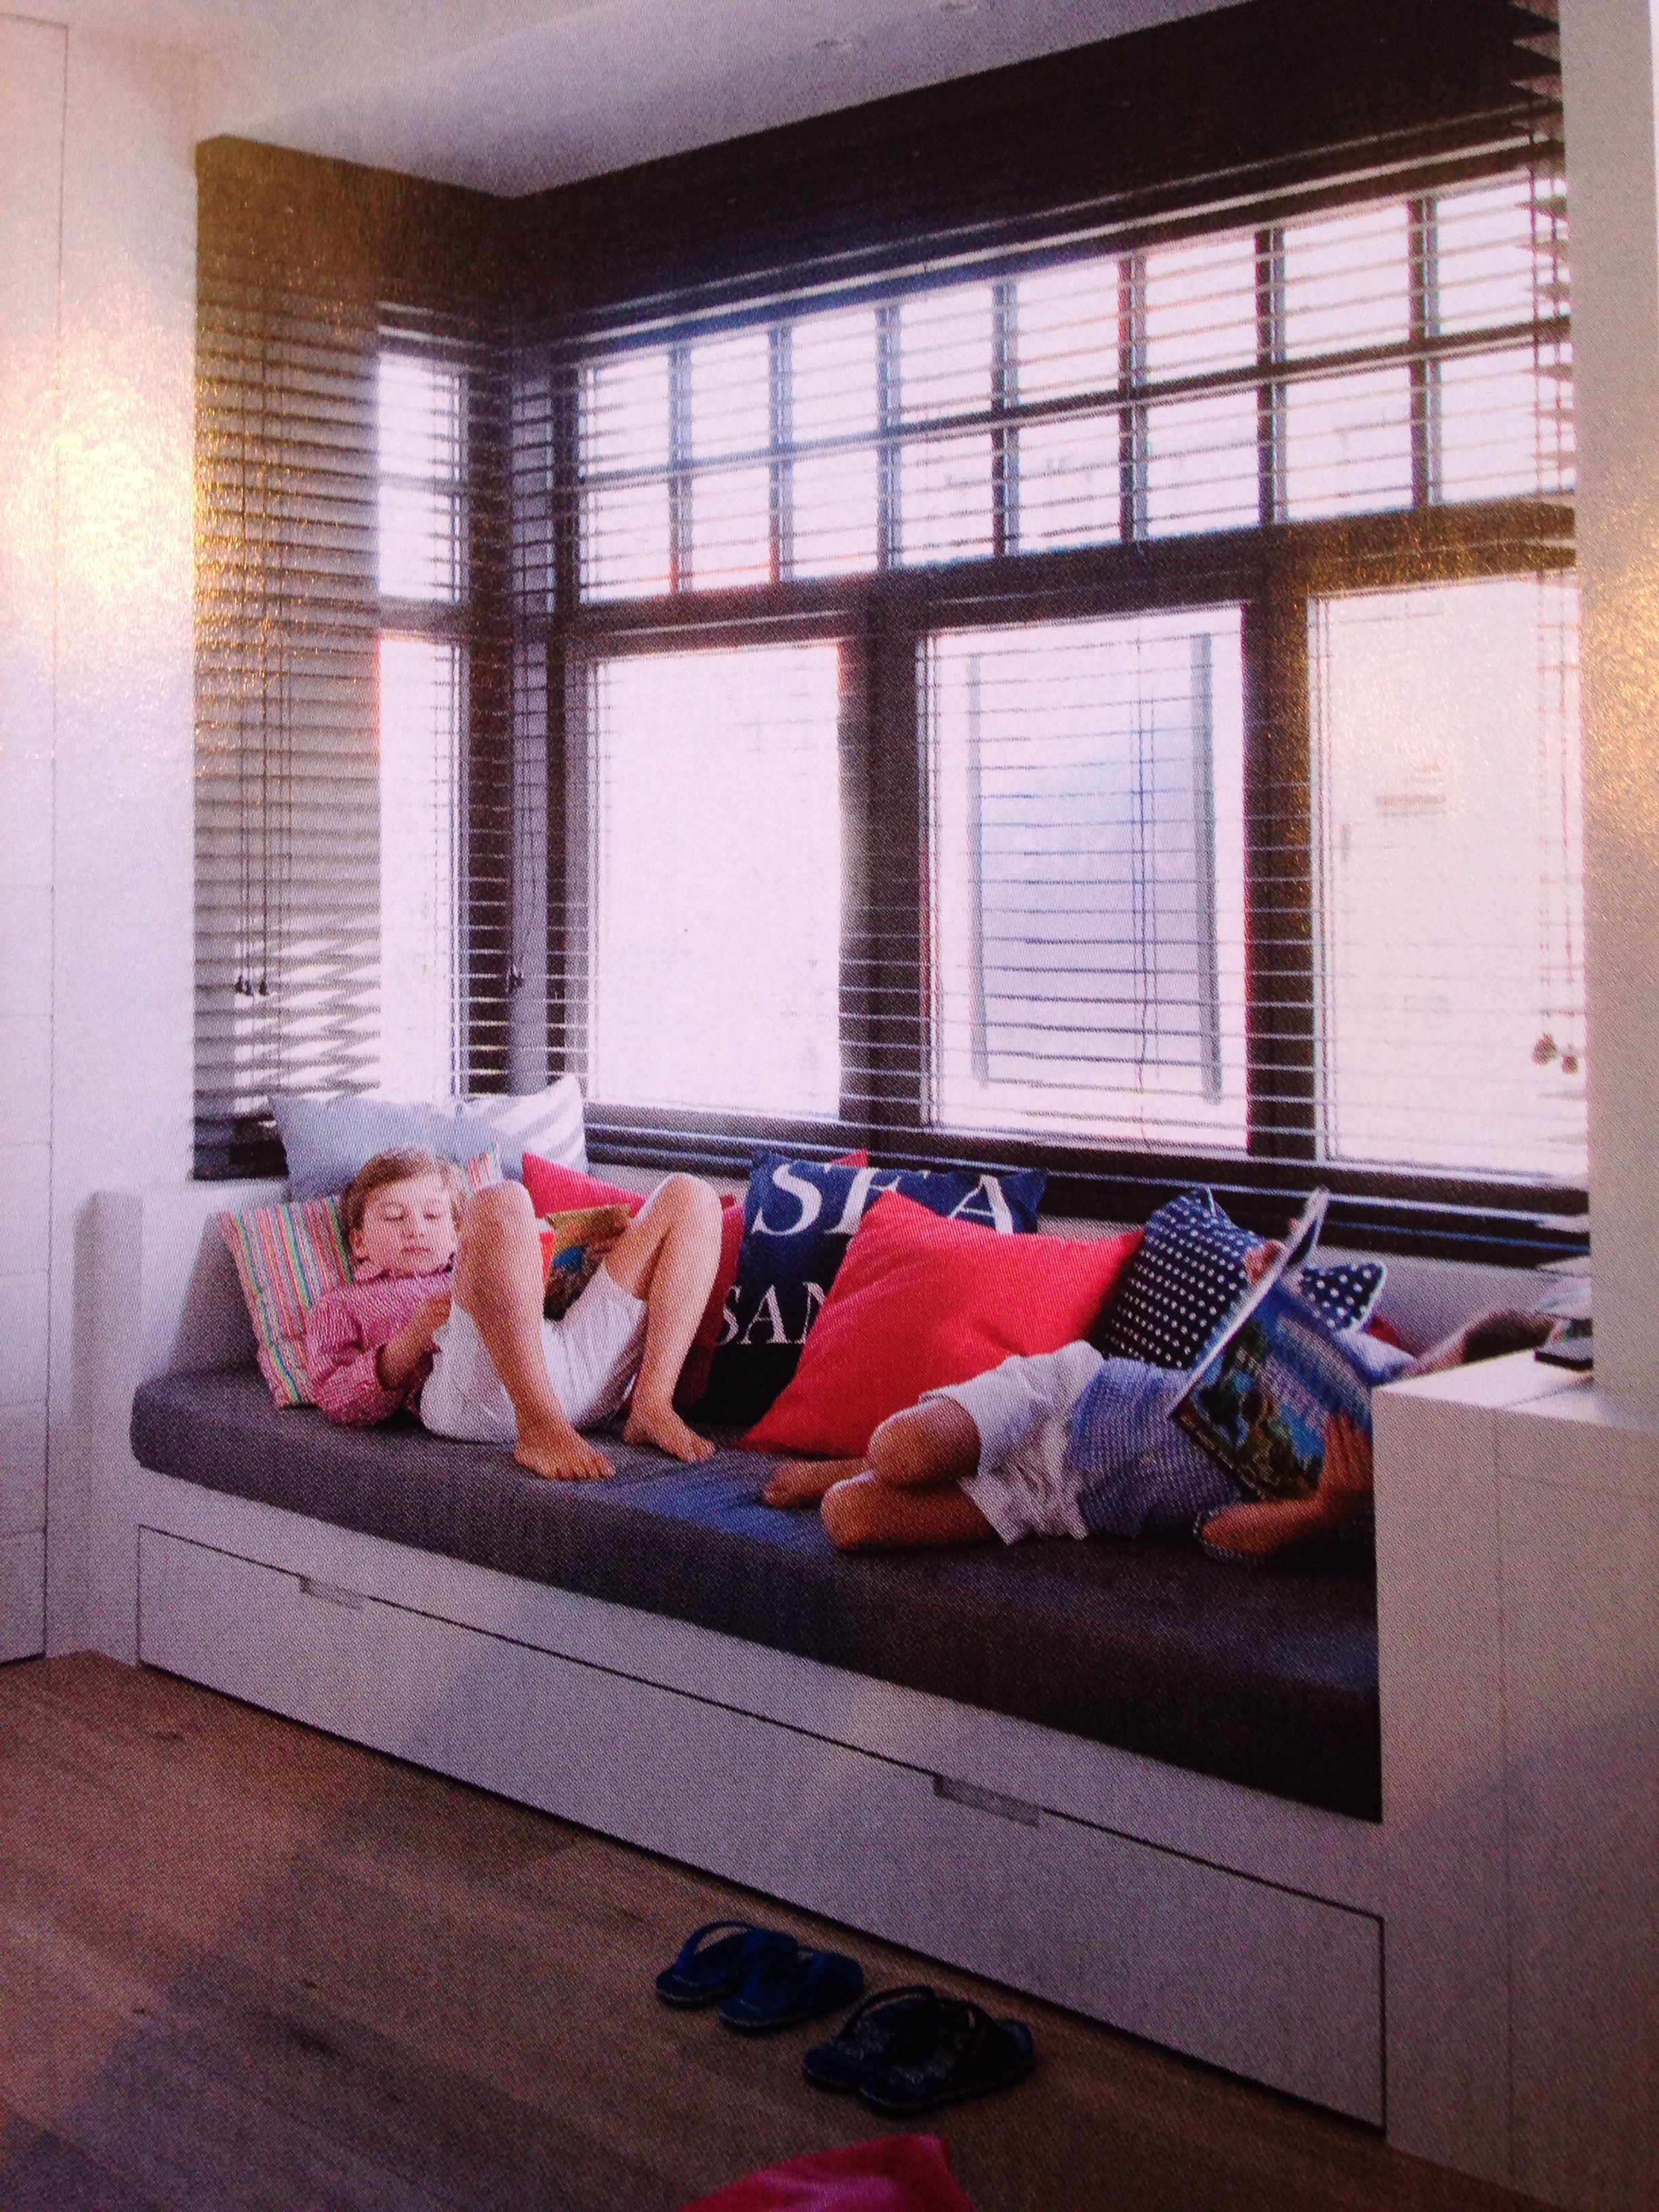 Opbergruimte erkerbank en donkere kleur muur mooi contrast met wit home pinterest serre - Coin bureau ontwerp ...